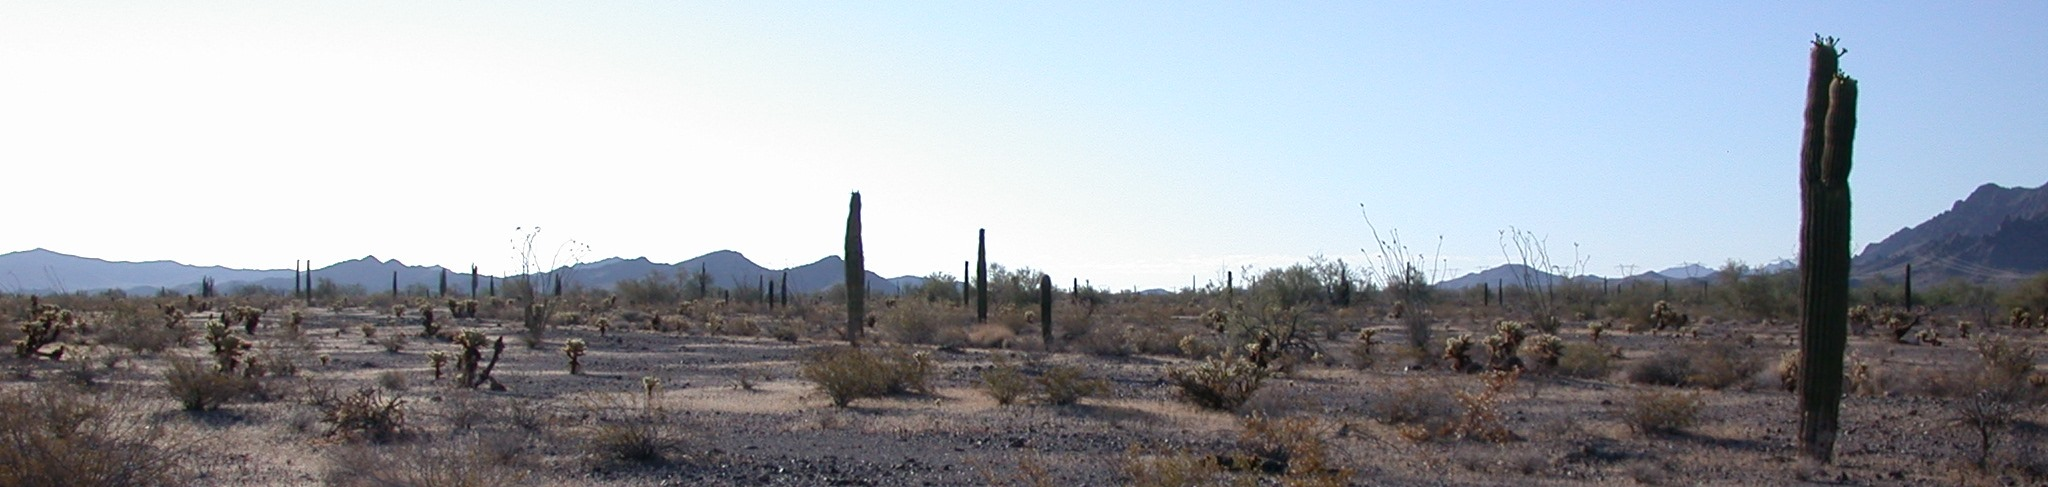 Saguaro cacti are the tallest things standing at Kofa National Wildlife Refuge, near Yuma, Arizona. Credit, Taly Drezner.